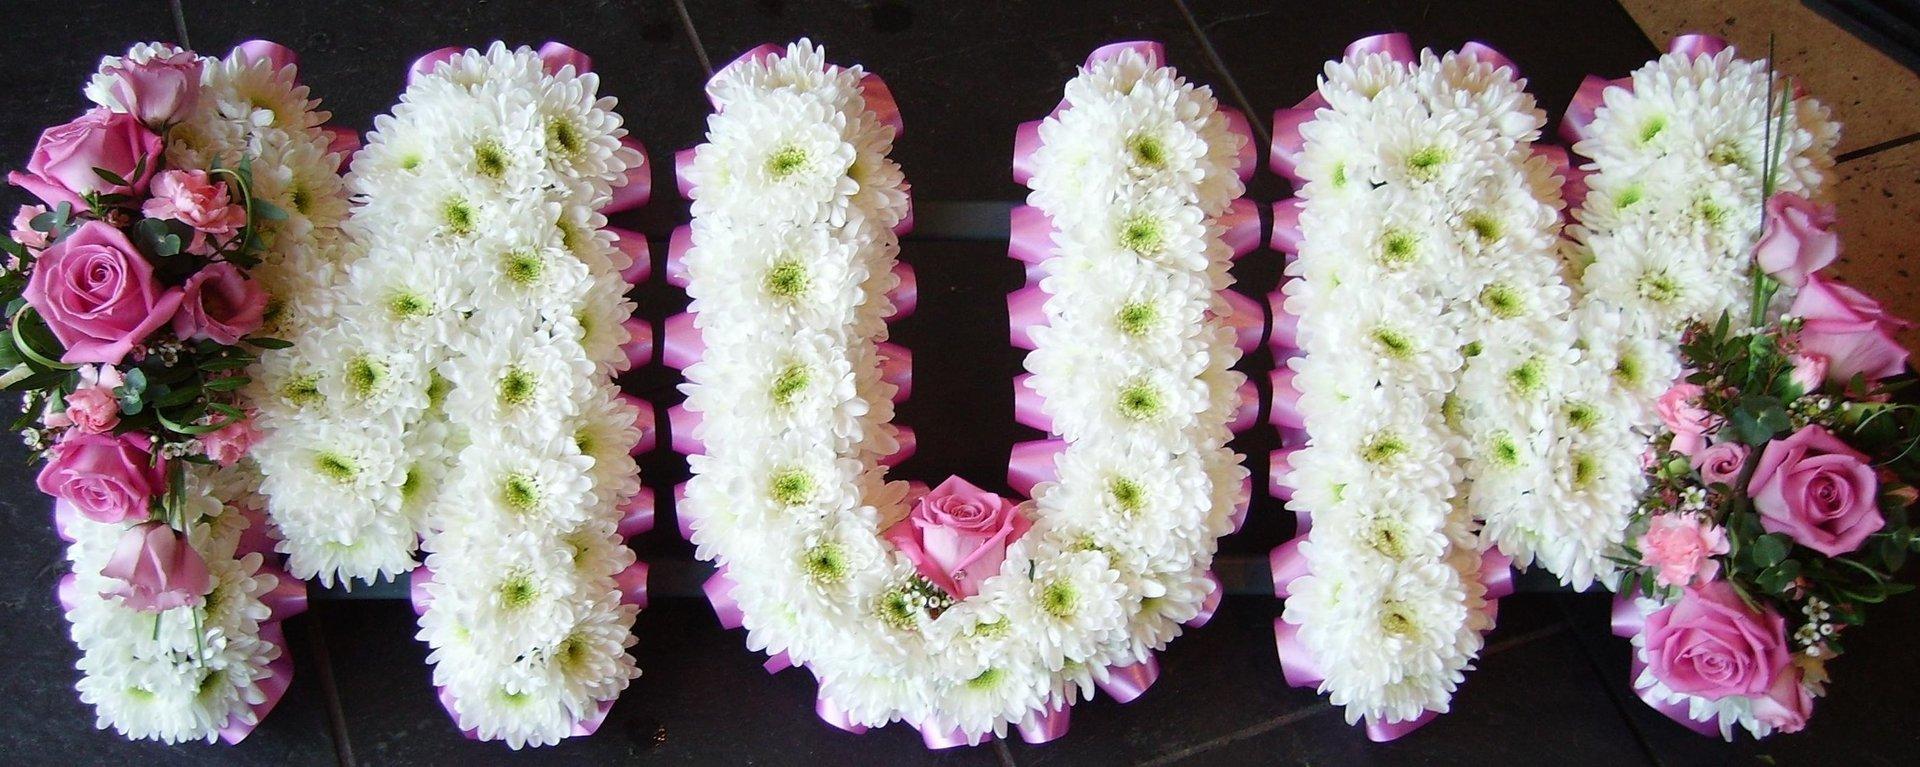 M U M lettered flowers